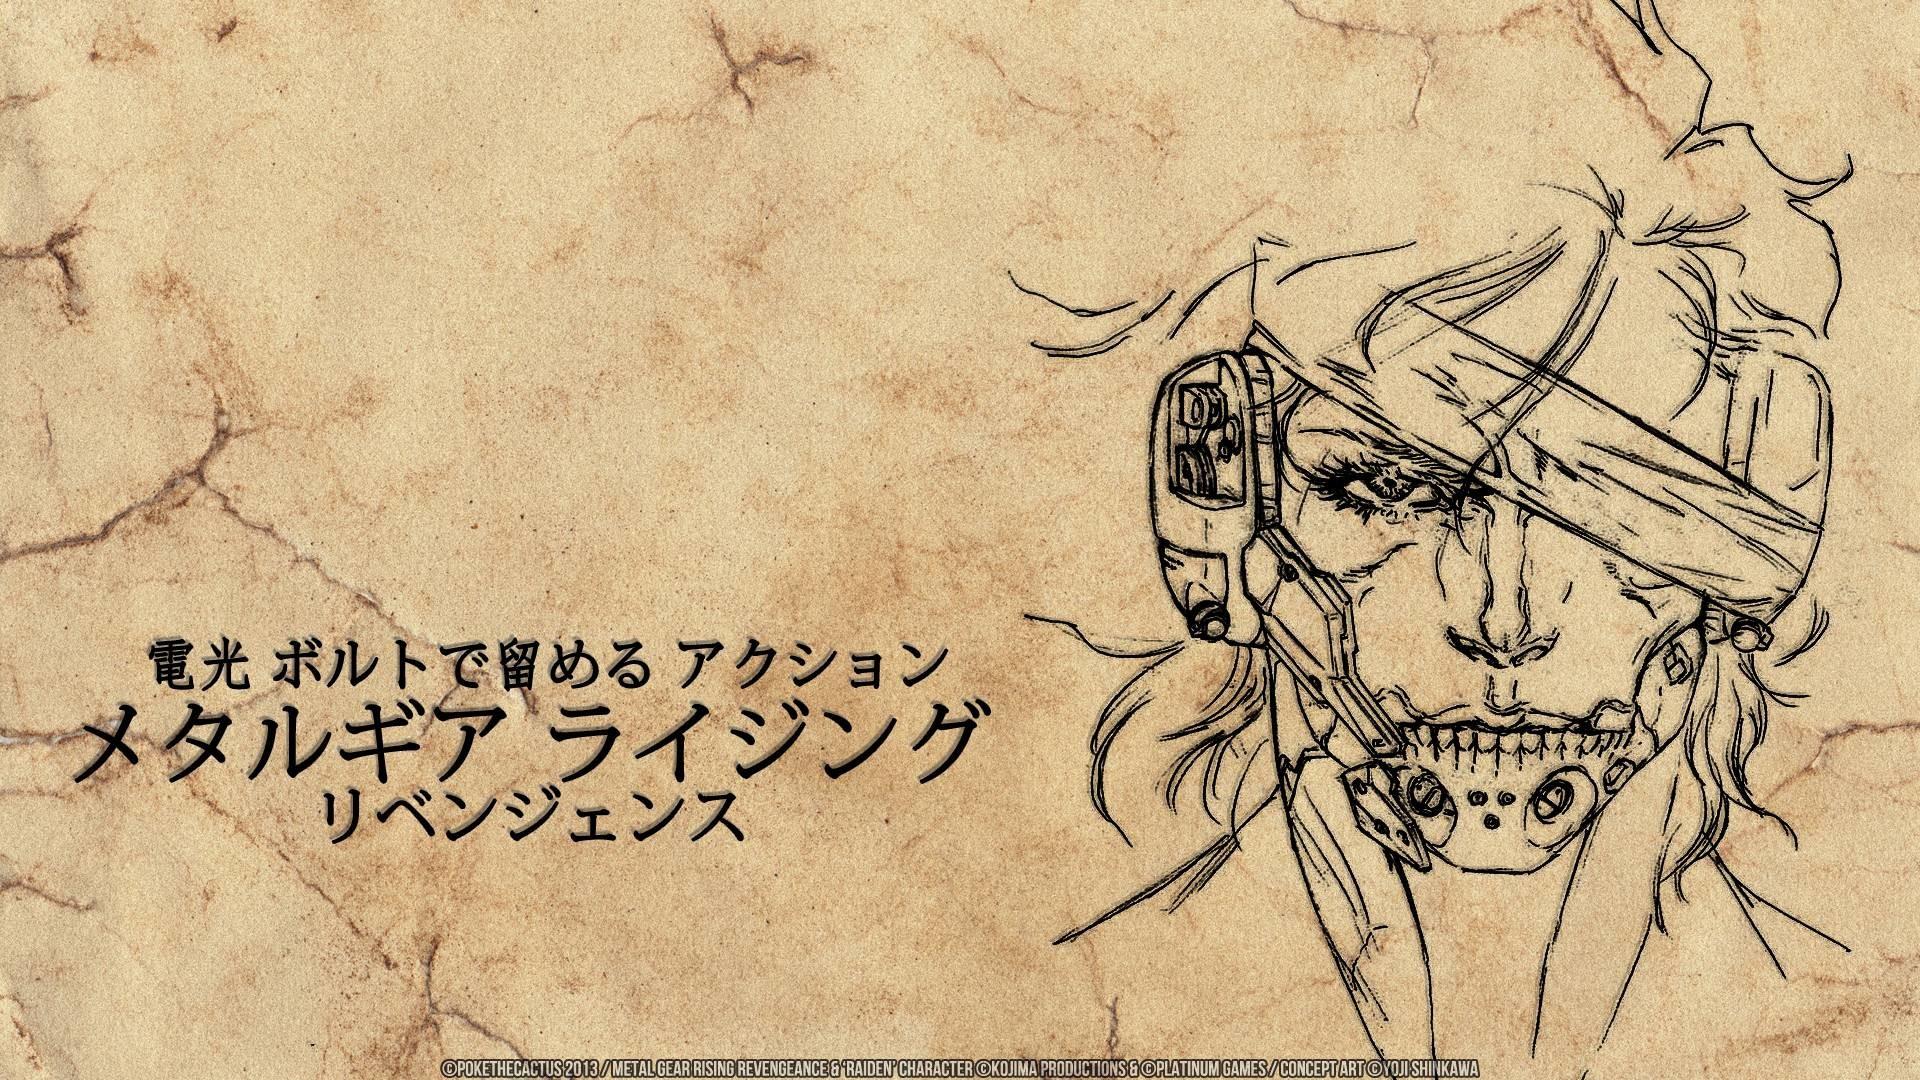 Res: 1920x1080, Japan Art Wallpaper - Viewing Gallery